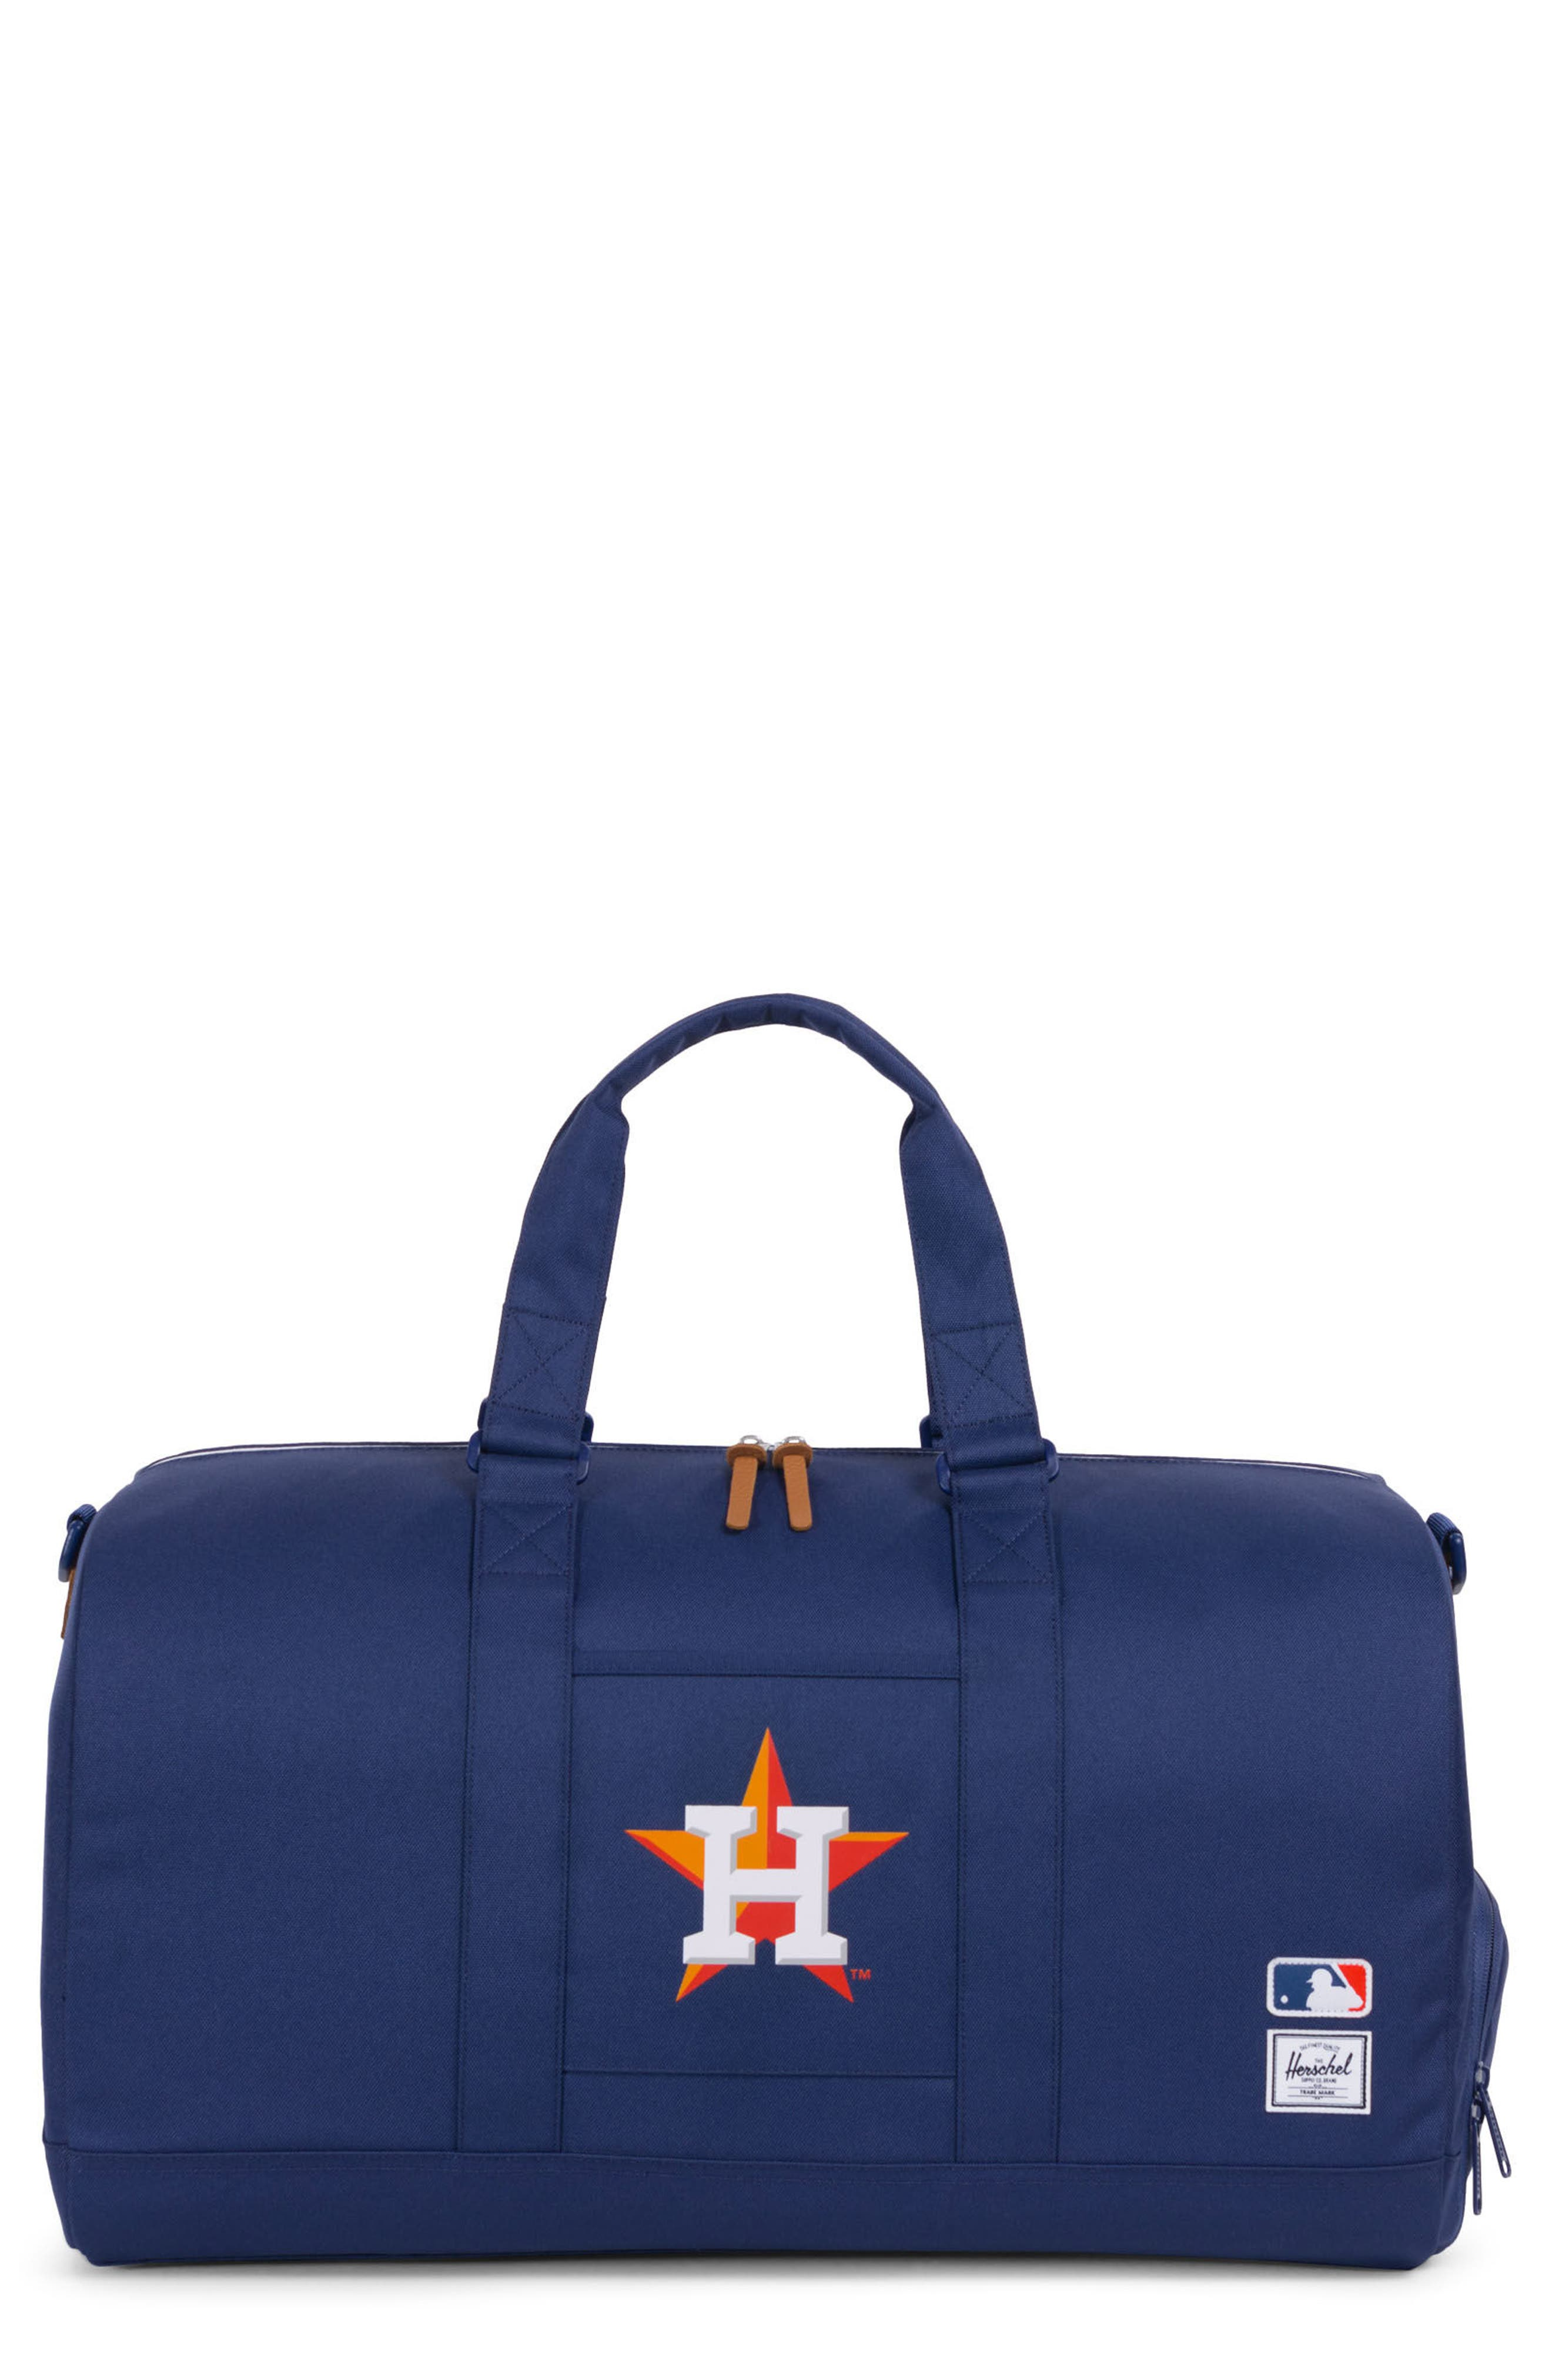 Main Image - Herschel Supply Co. Novel - MLB American League Duffel Bag